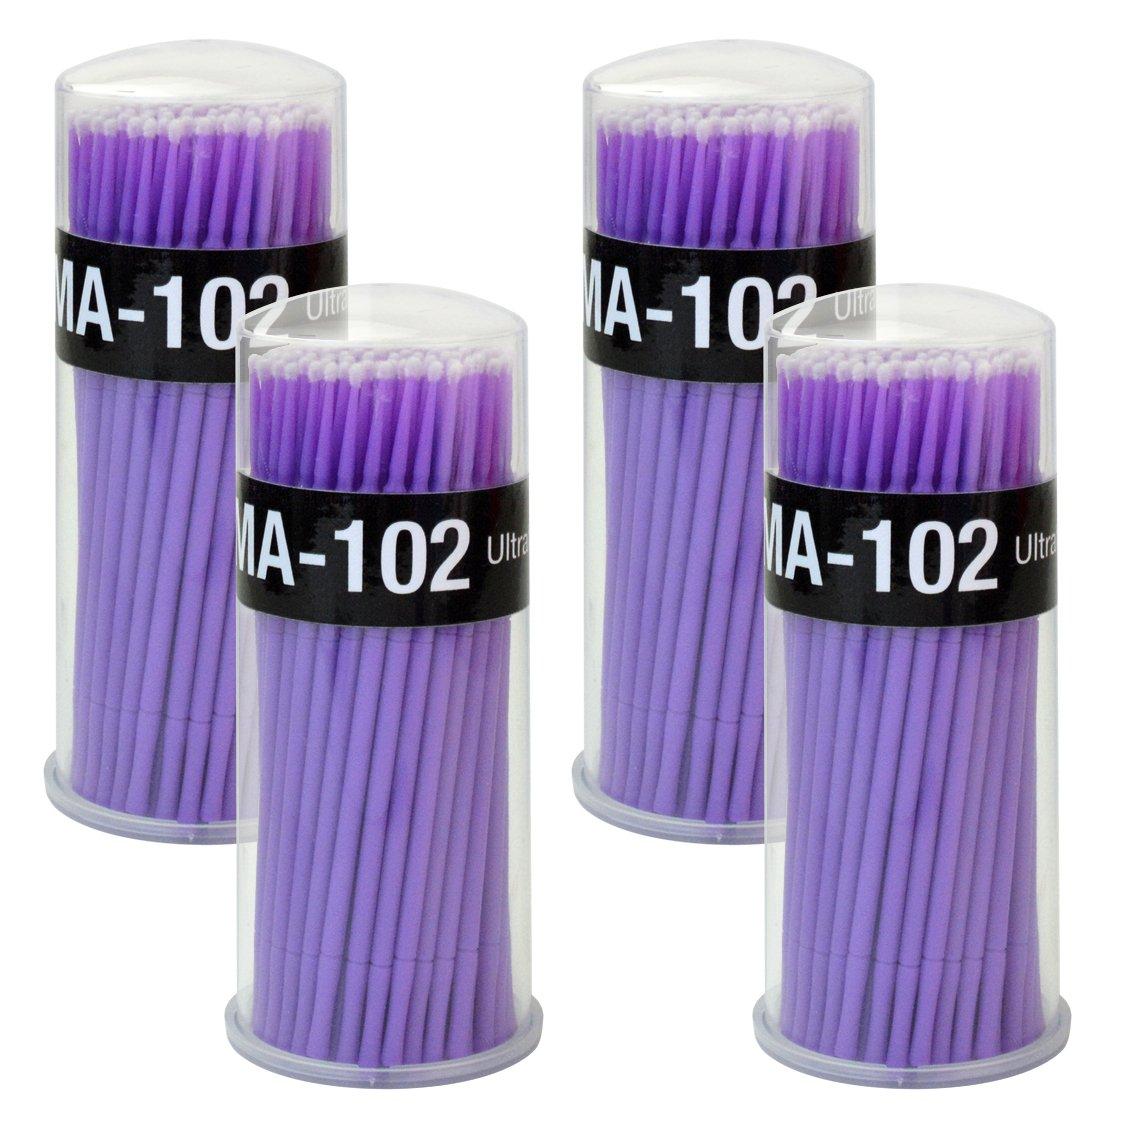 Rbenxia 400pcs Micro Applicators Disposable Brushes for Eyelash Extensions Dental Oral Using